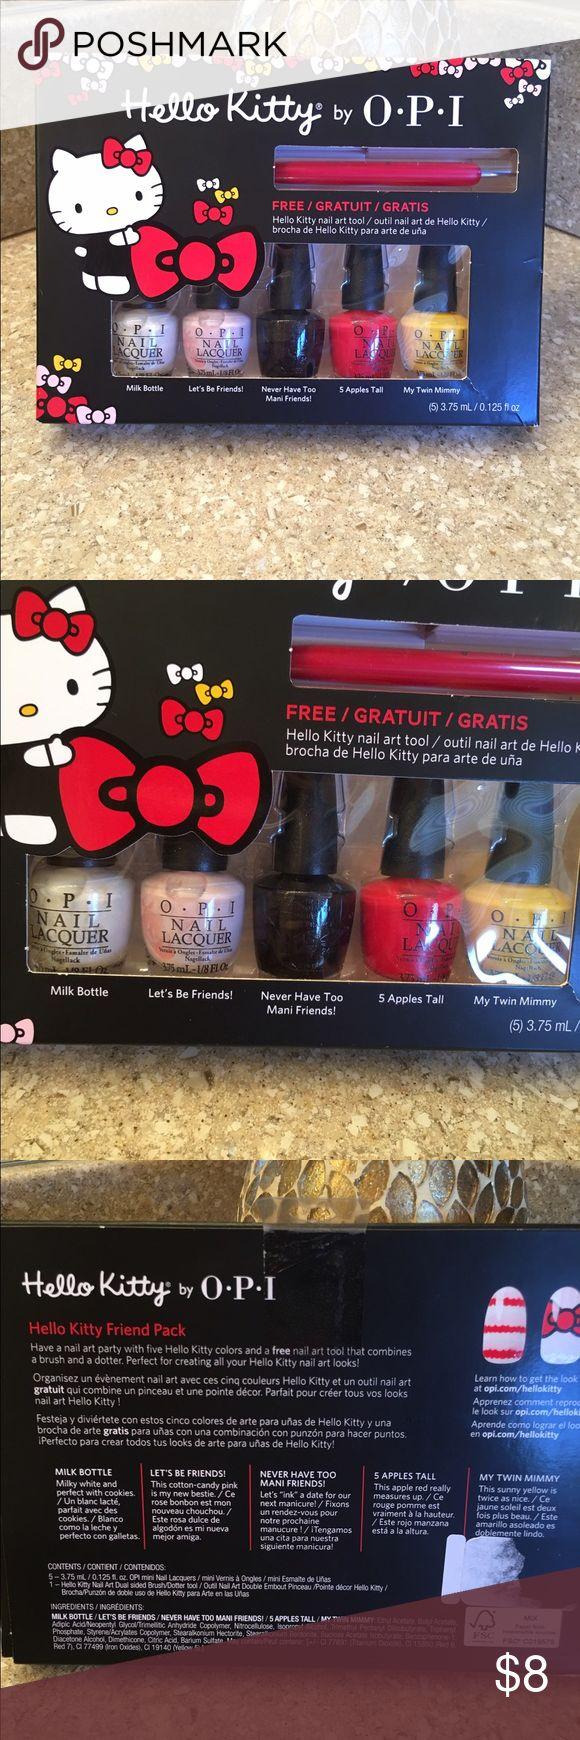 Hello Kitty OPI nail polish kit. Brand new 5- OPI nail polishes with a design tool.  New Hello Kitty Makeup